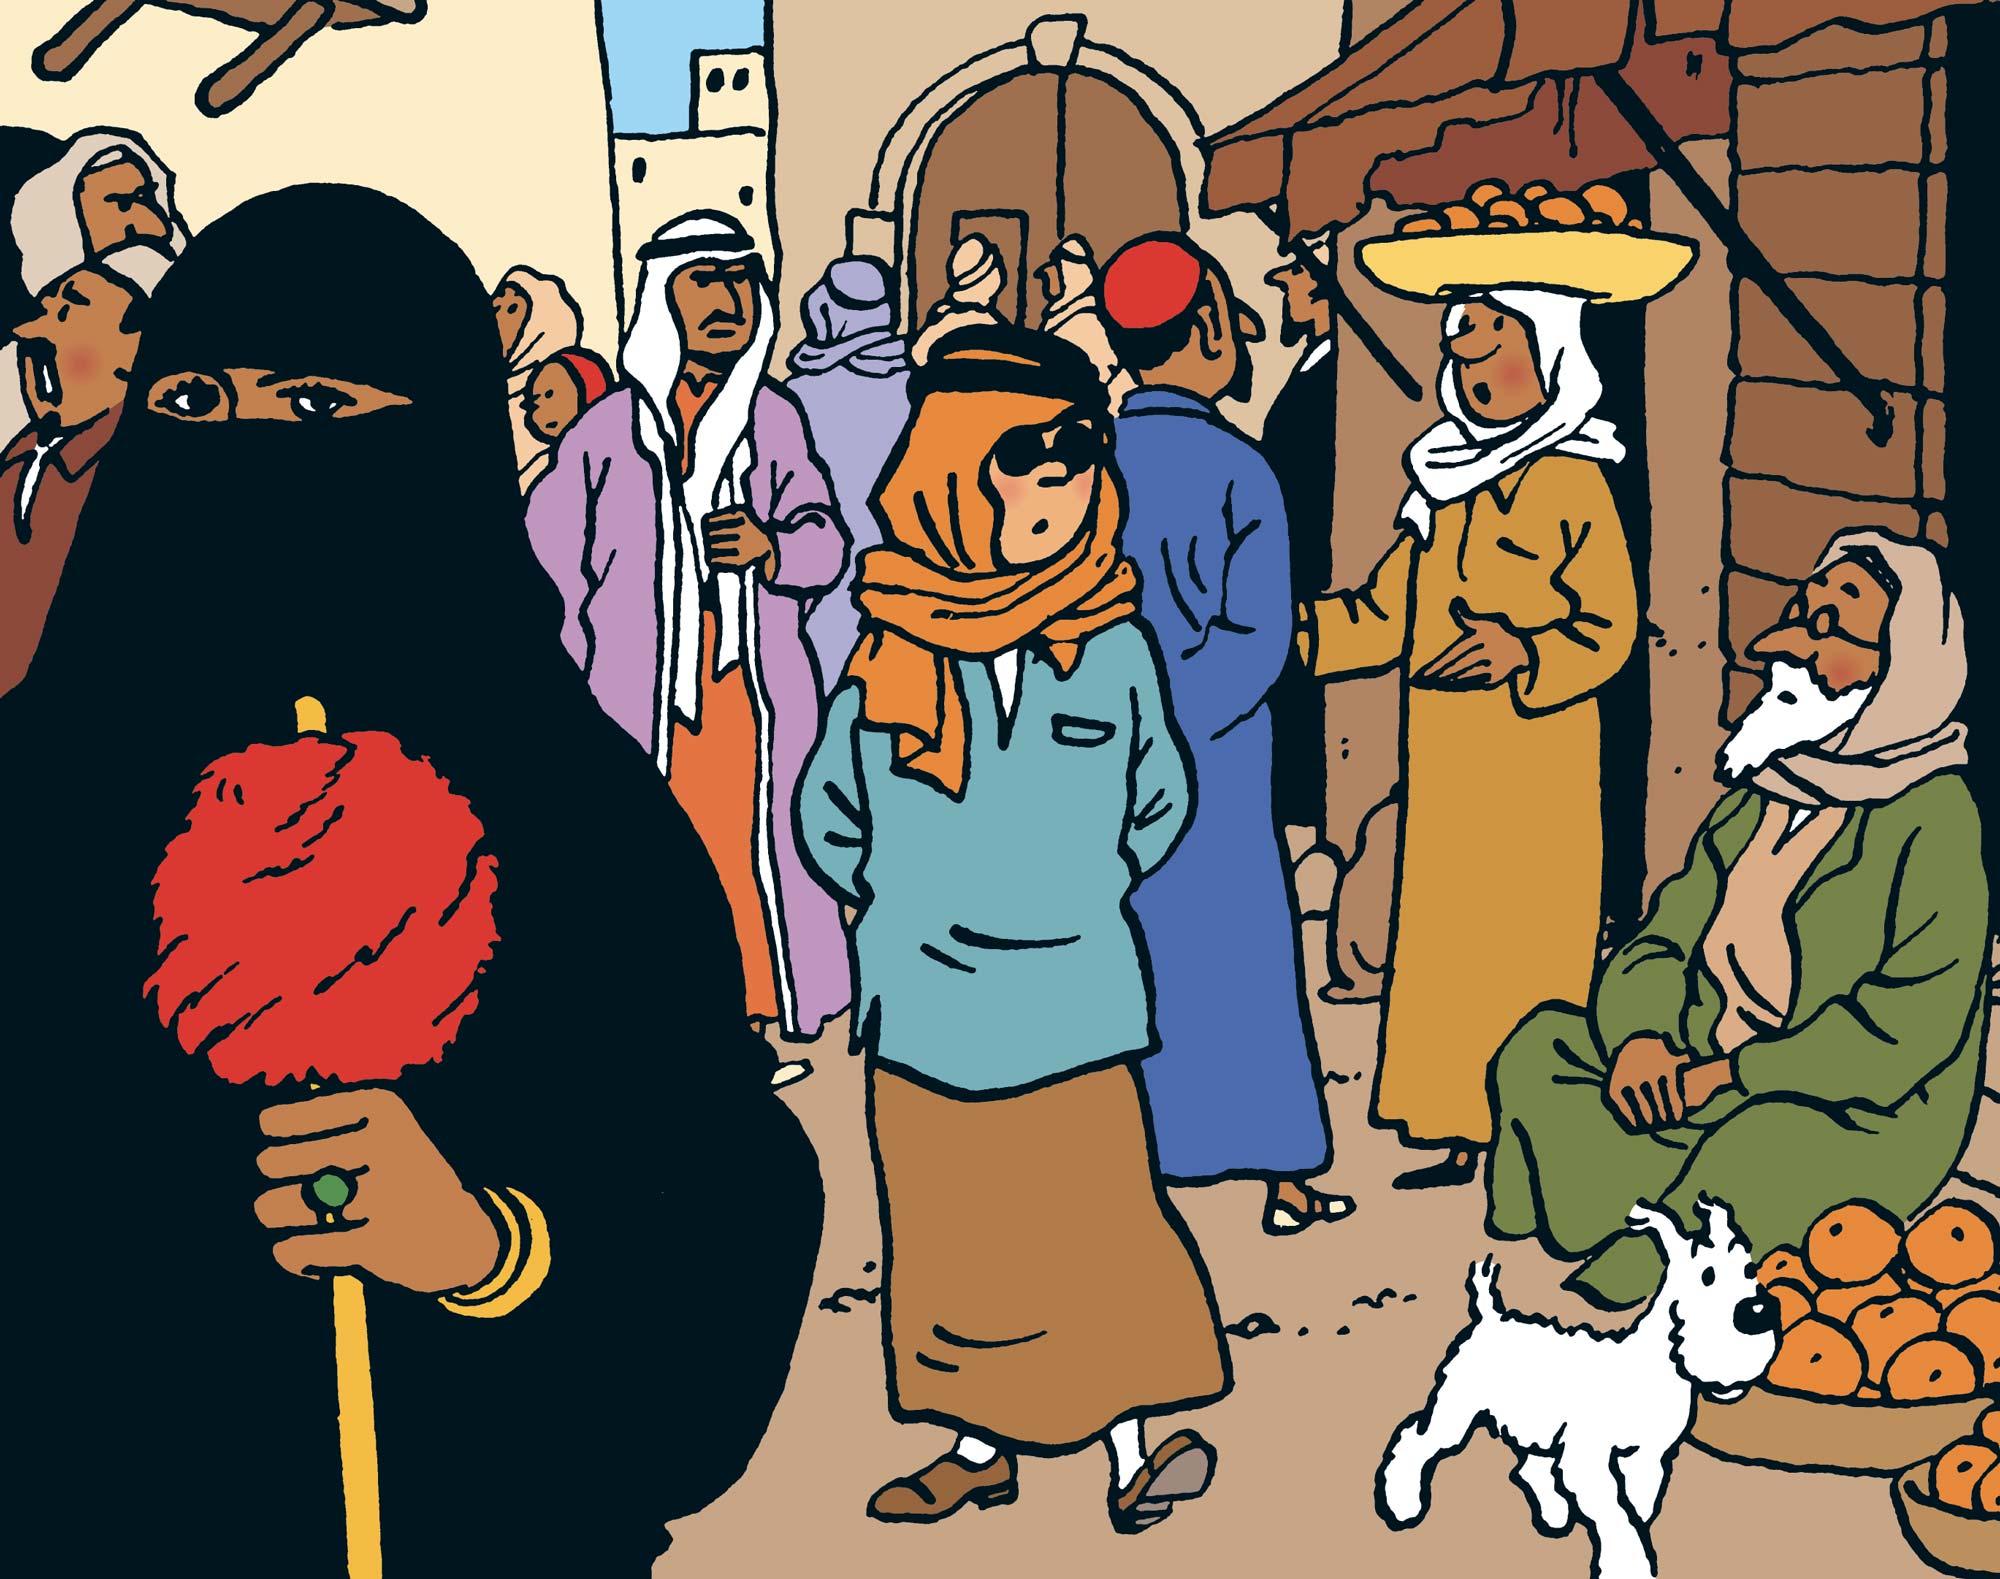 Tintin - Les Aventures de Tintin - Tintin au pays de l'or noir